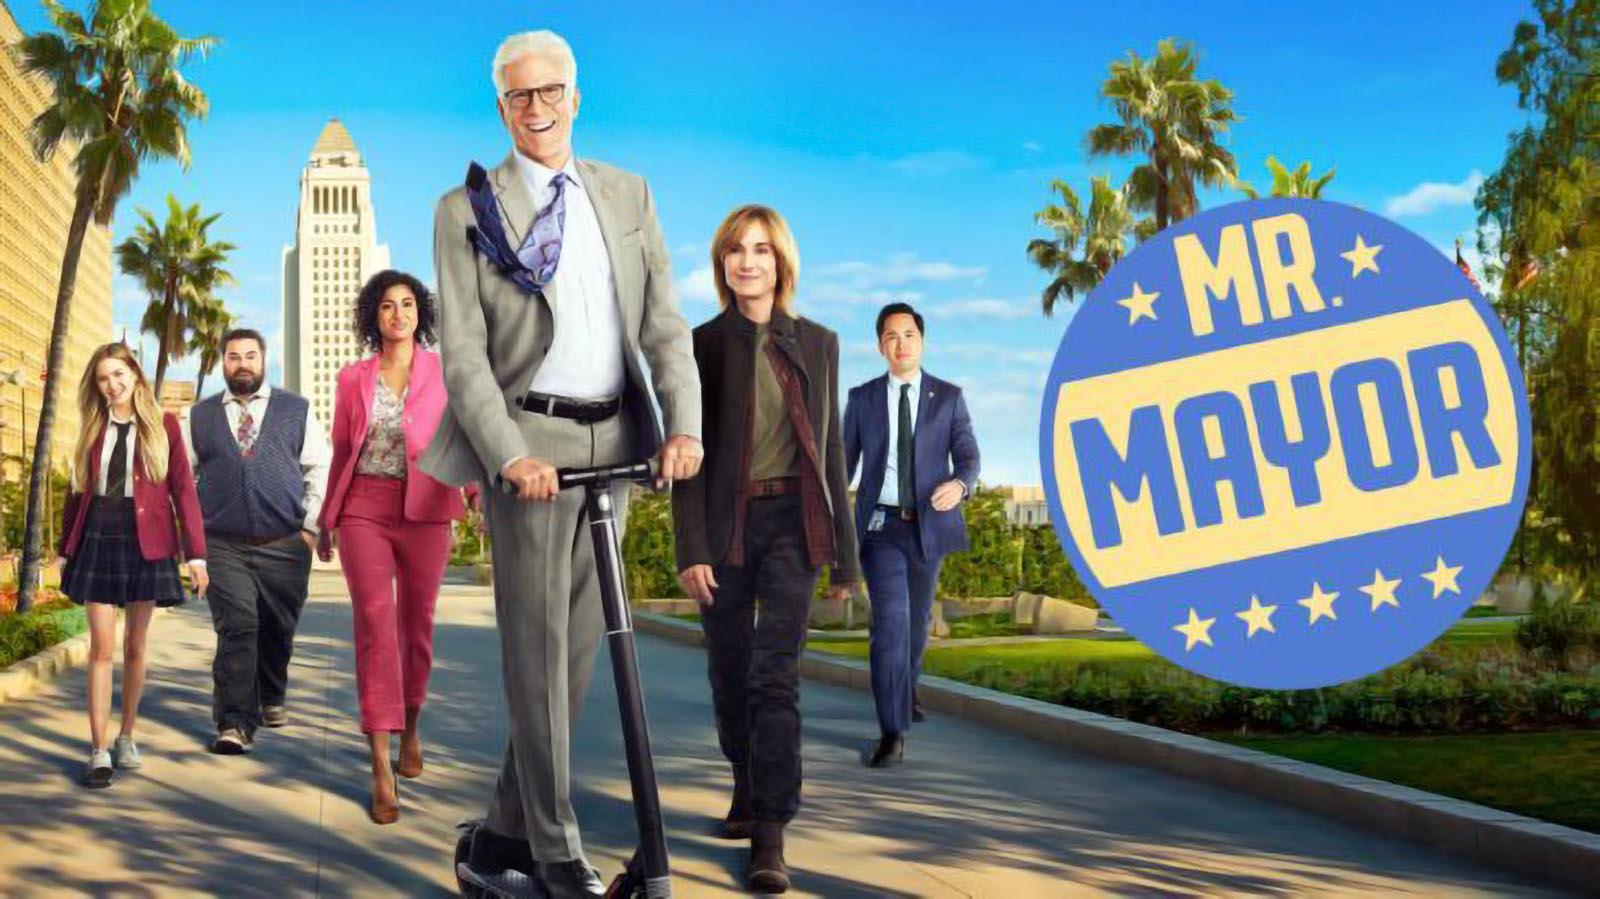 Mr Mayor An American TV Sitcom